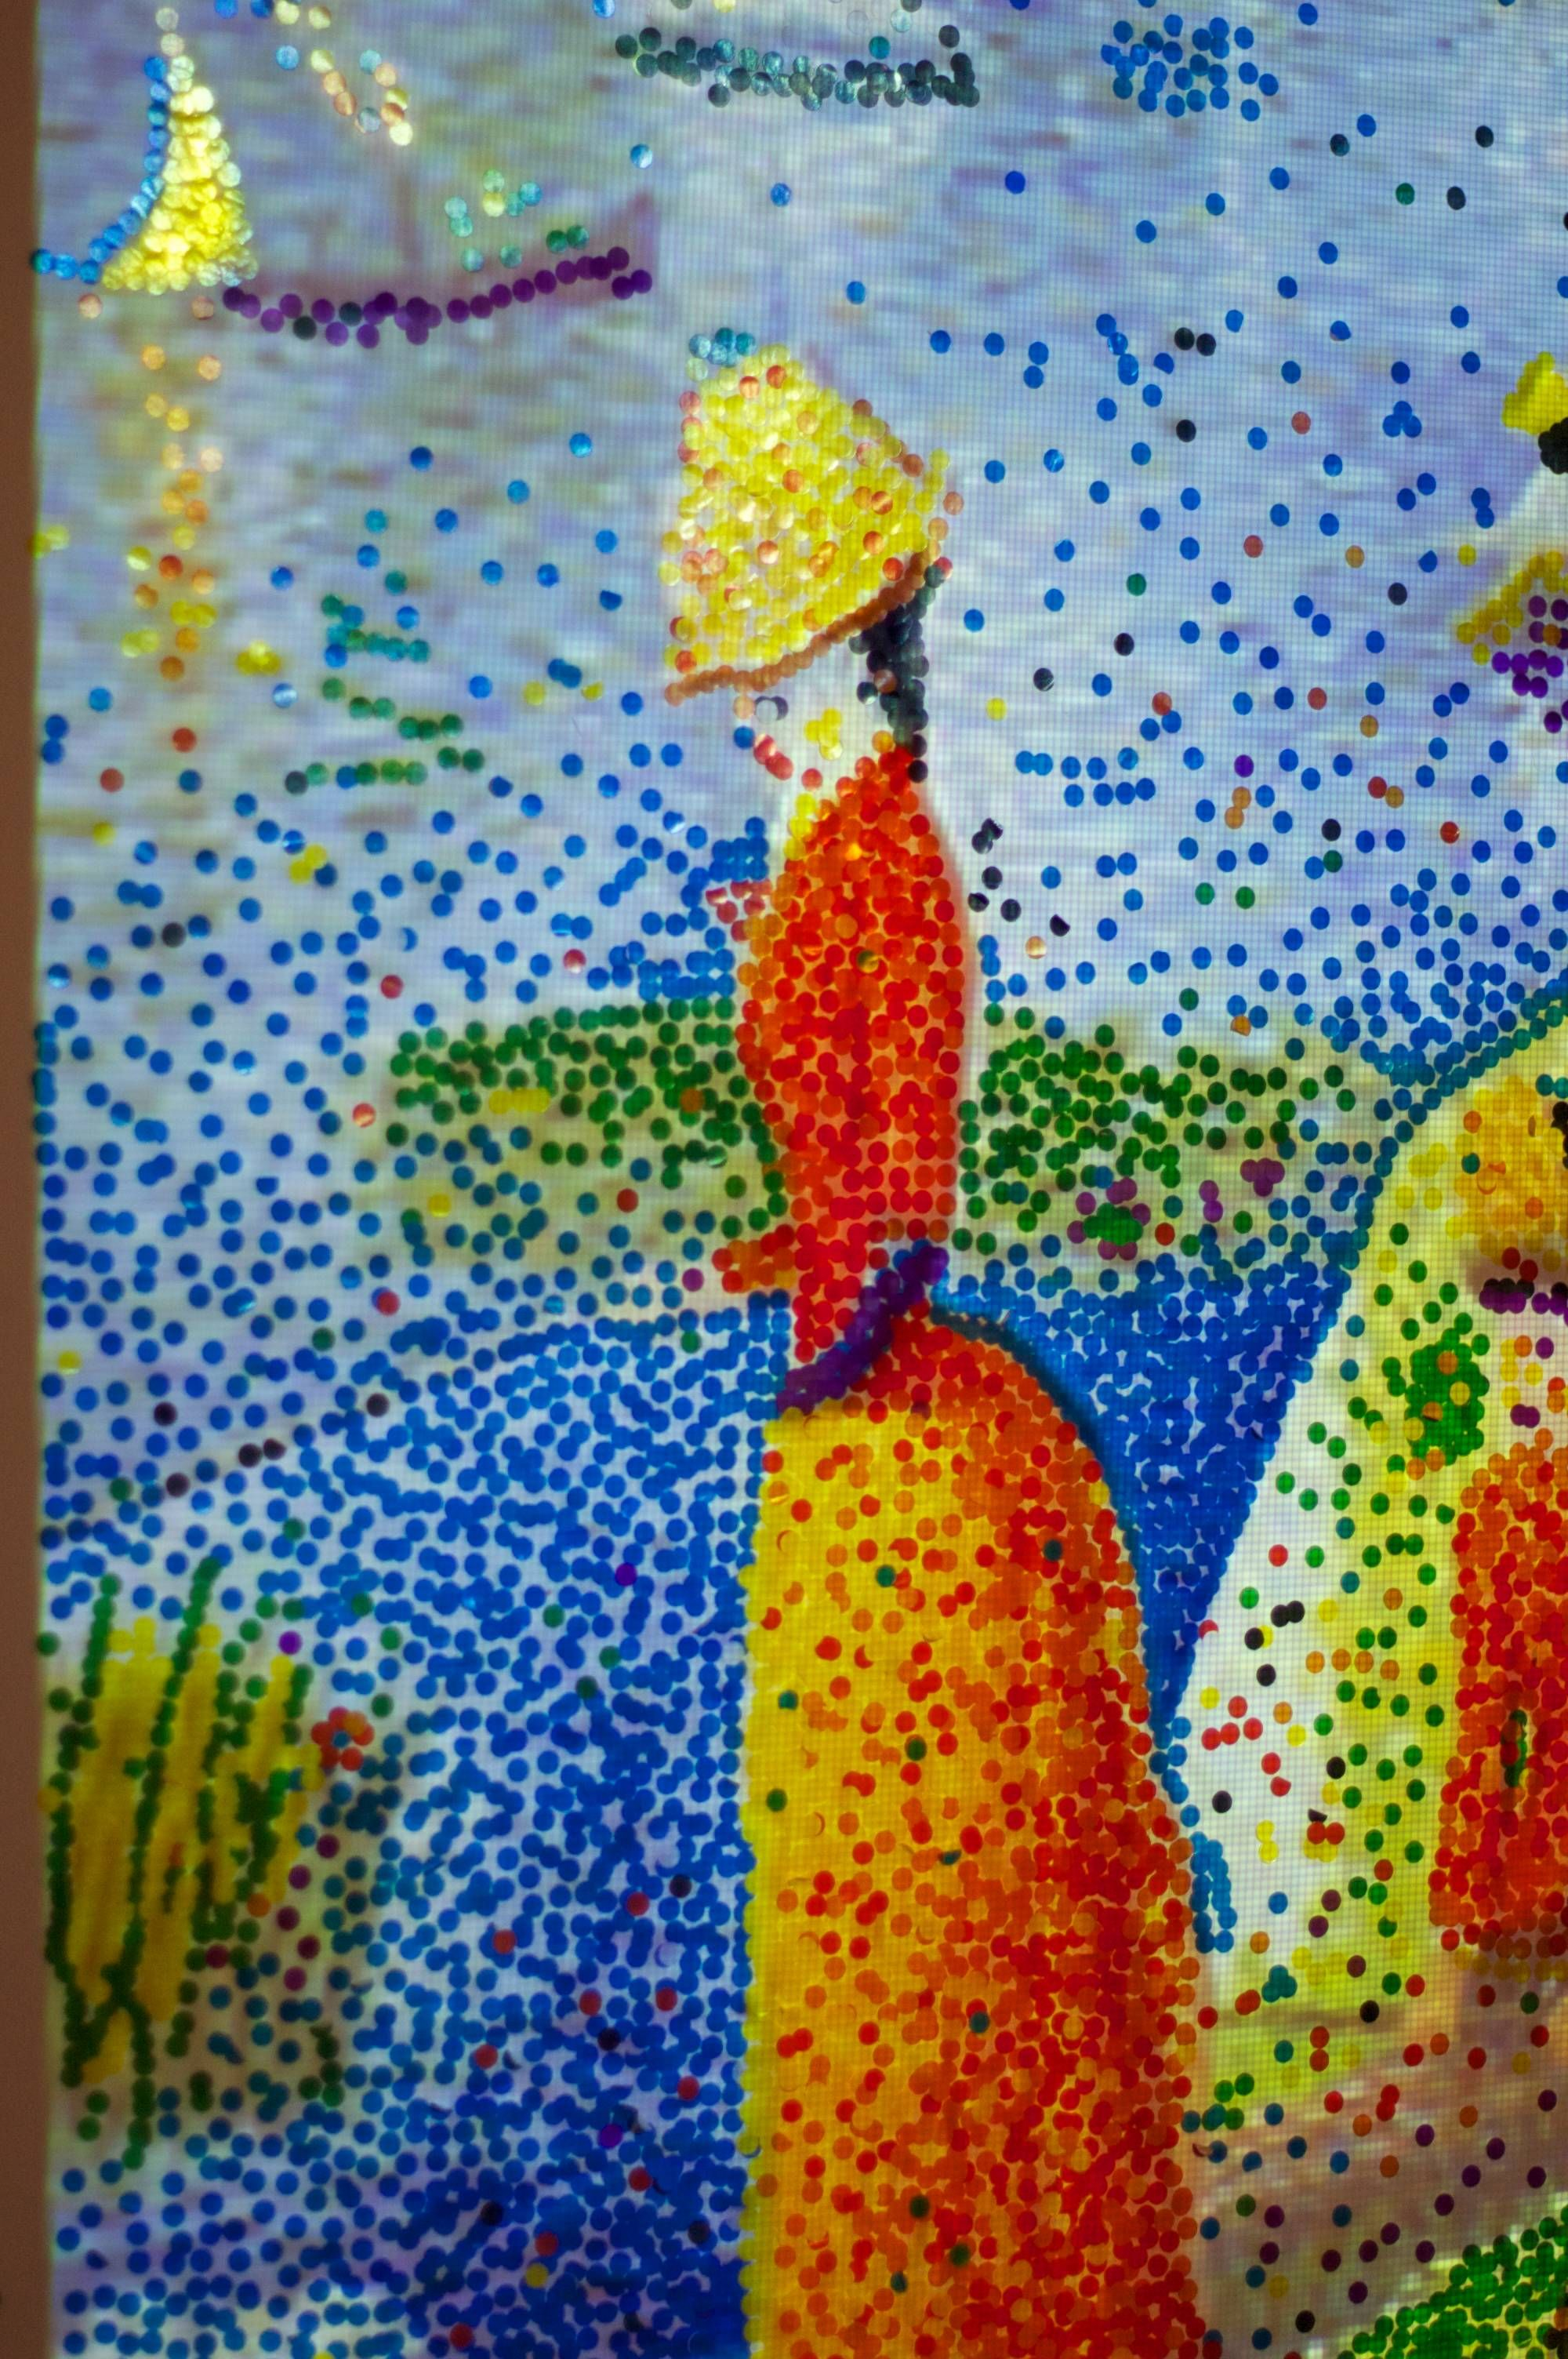 Images About Pointillism